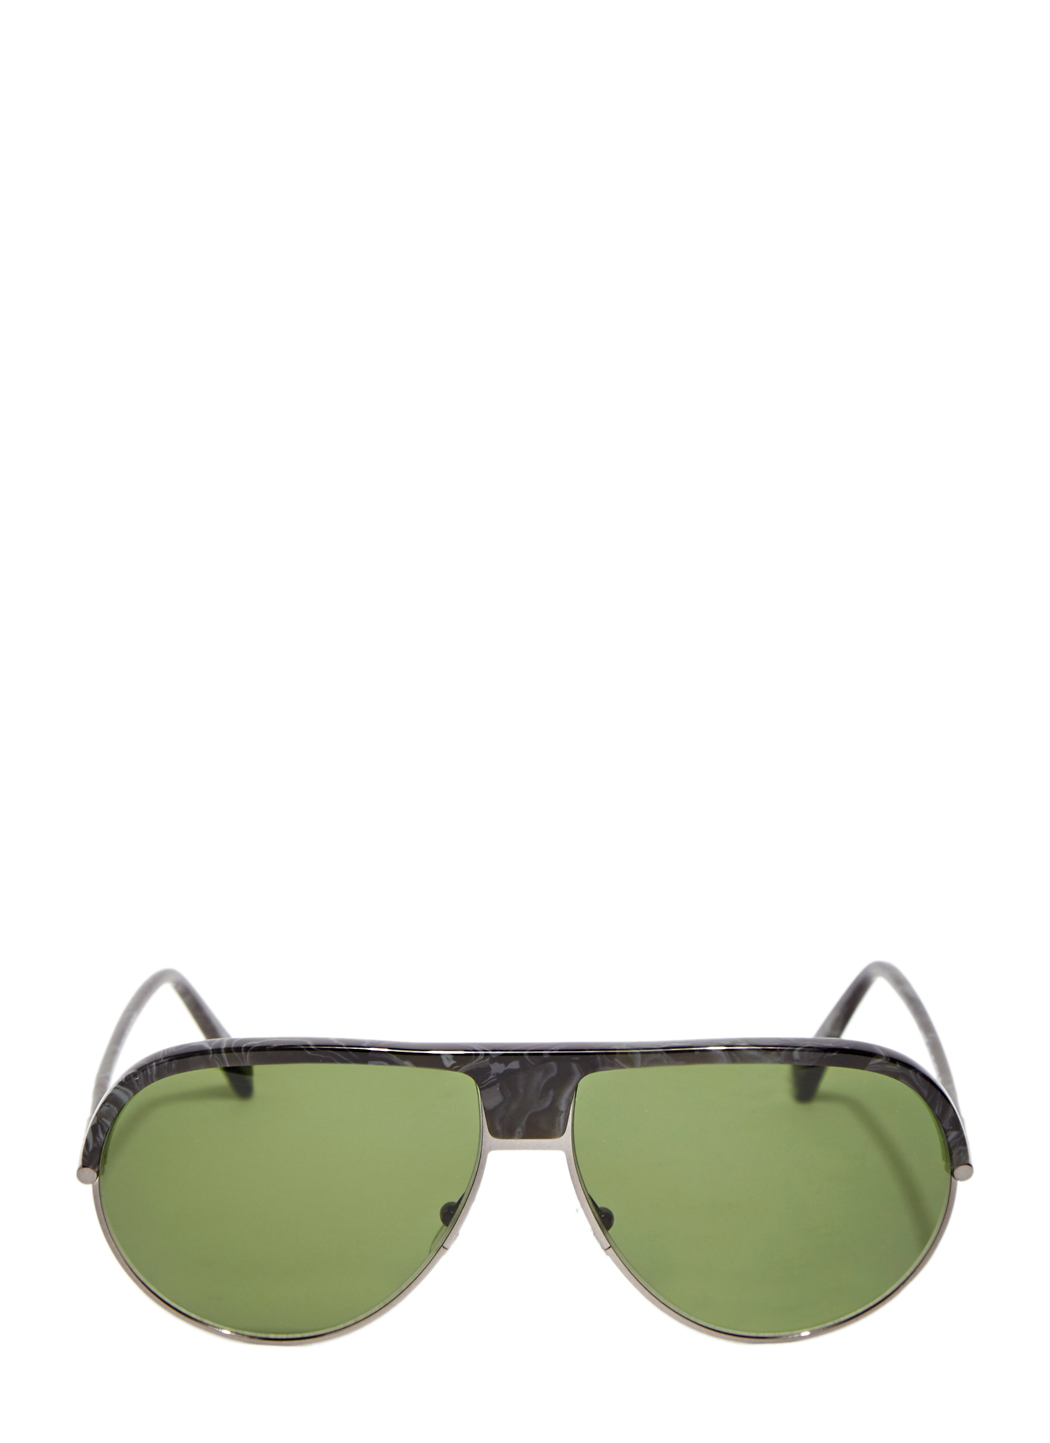 000e2c0f64080e Lyst - Andy Wolf Men s Might C Sunglasses In Grey in Gray for Men